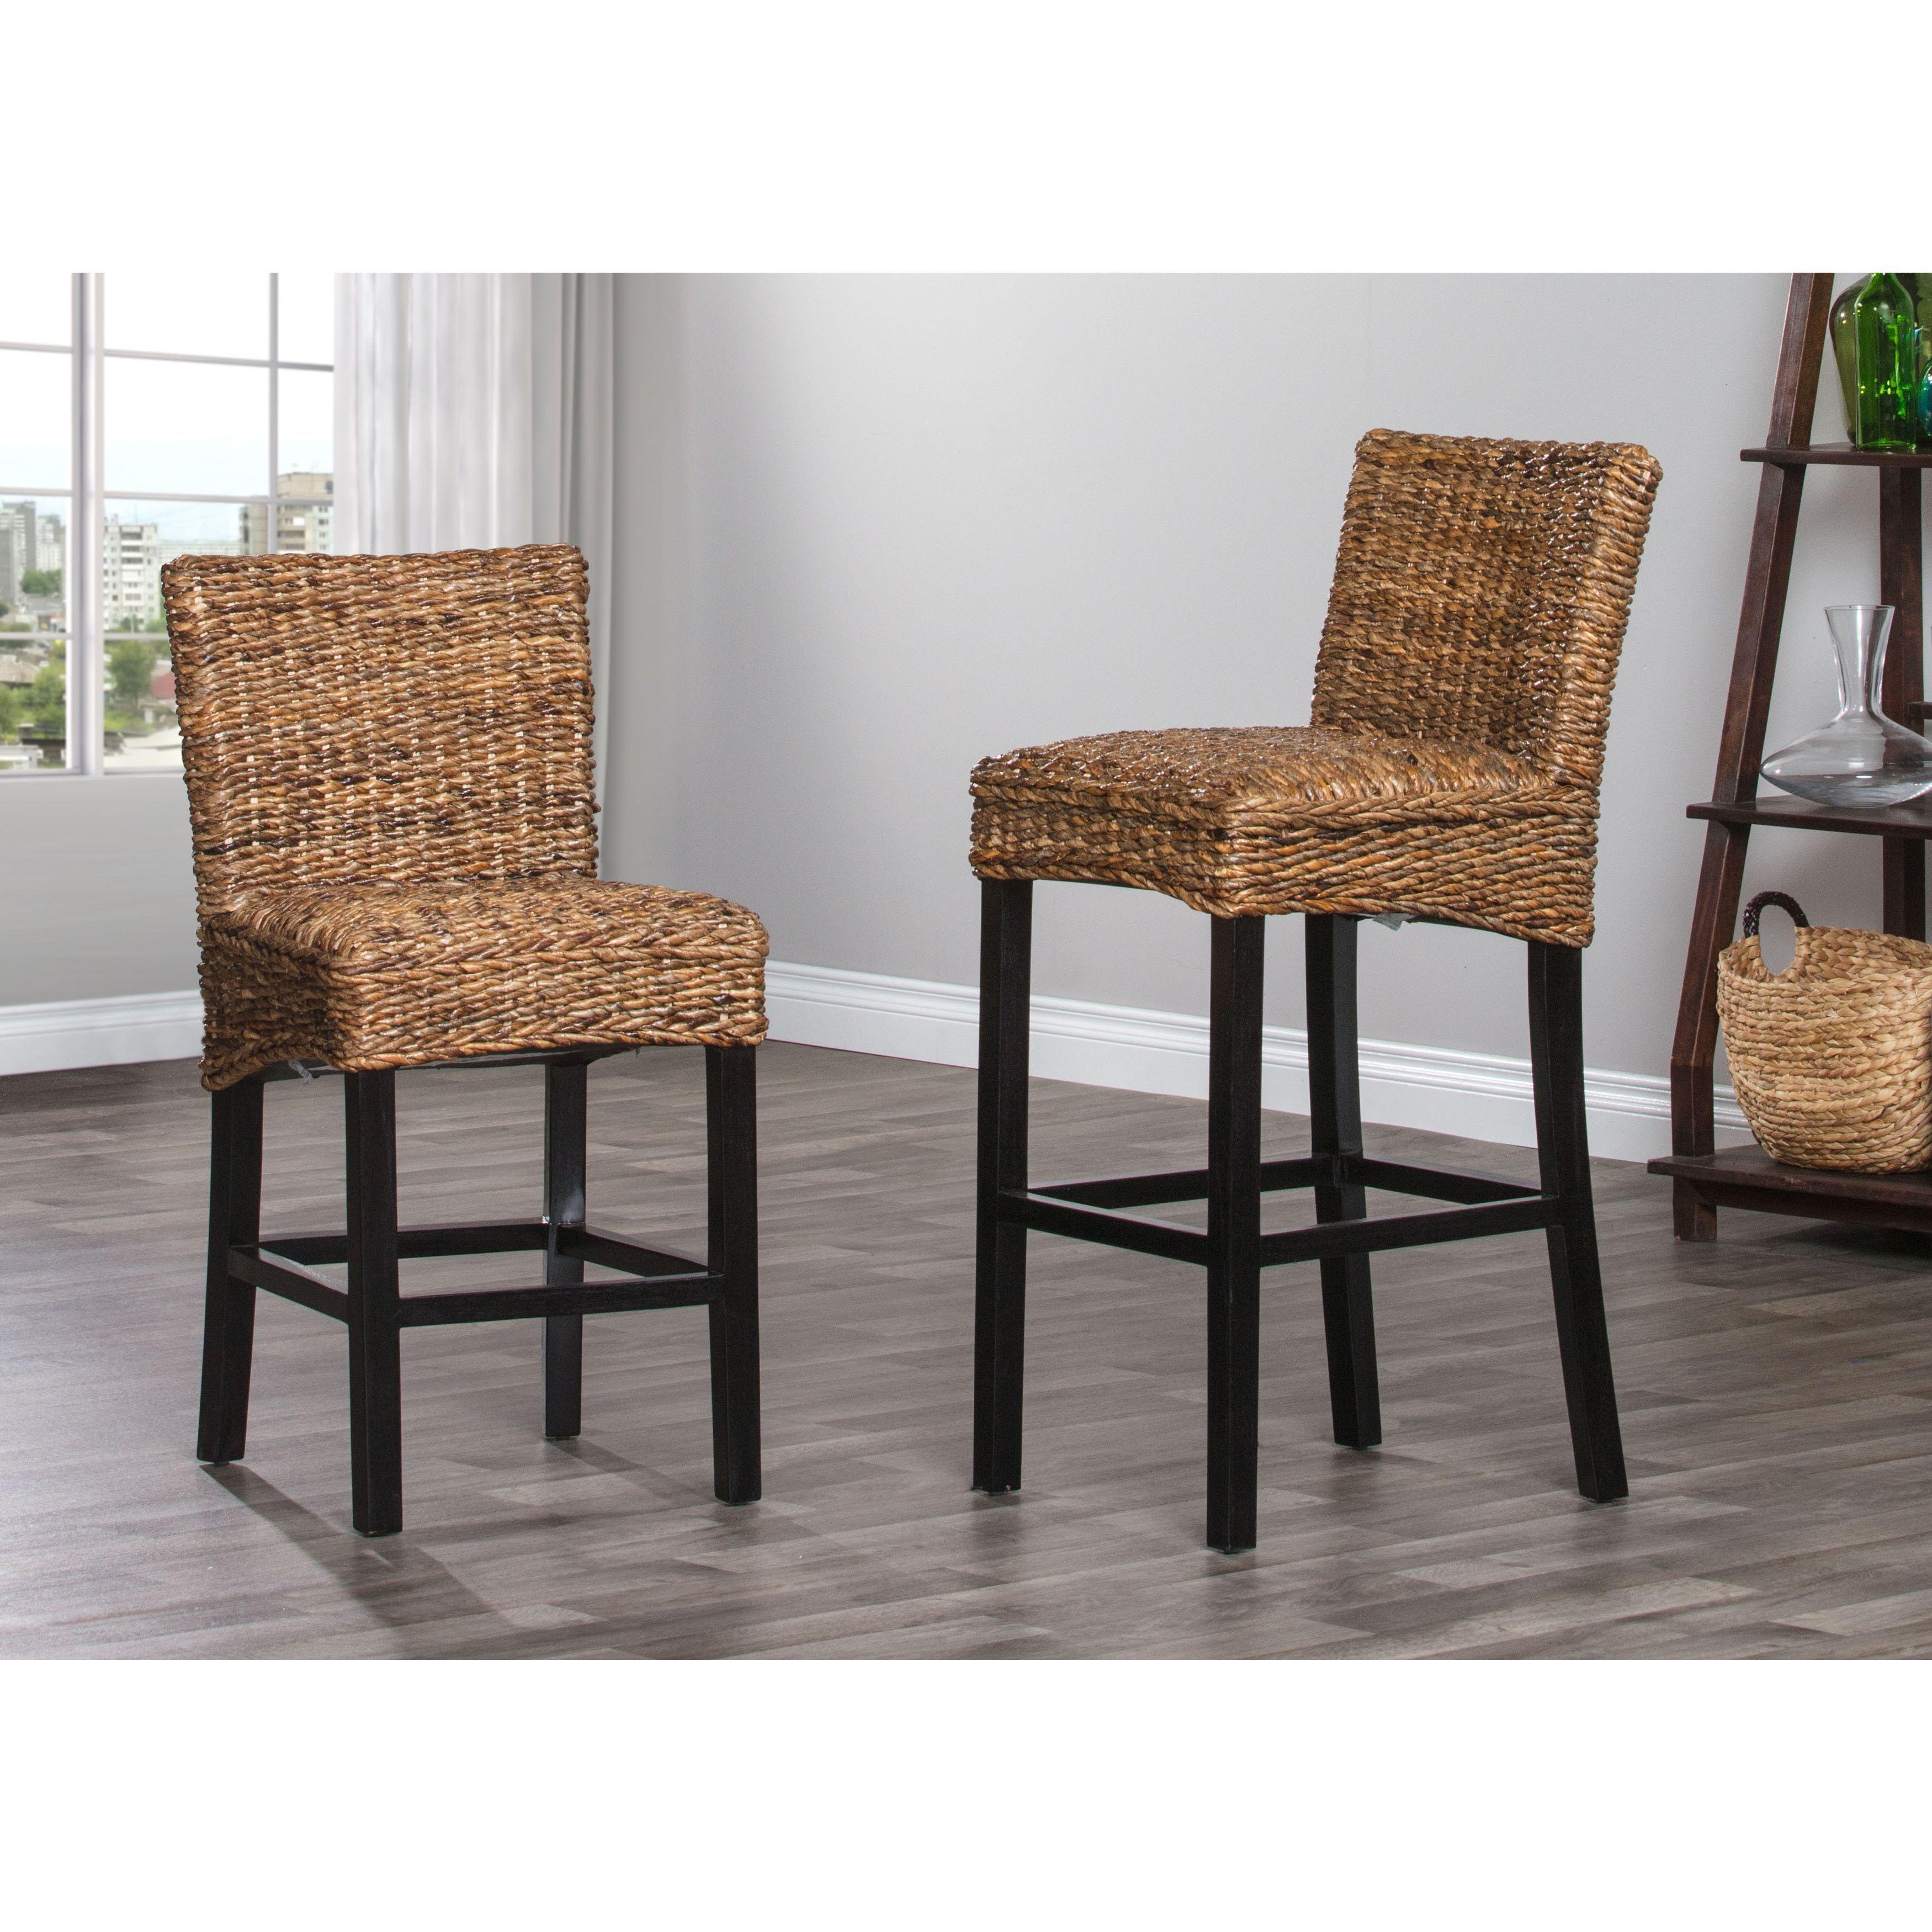 24 Inch Counter Chairs Target Bean Bag Toddler Portman Rattan Stool By Kosas Home Black Wood